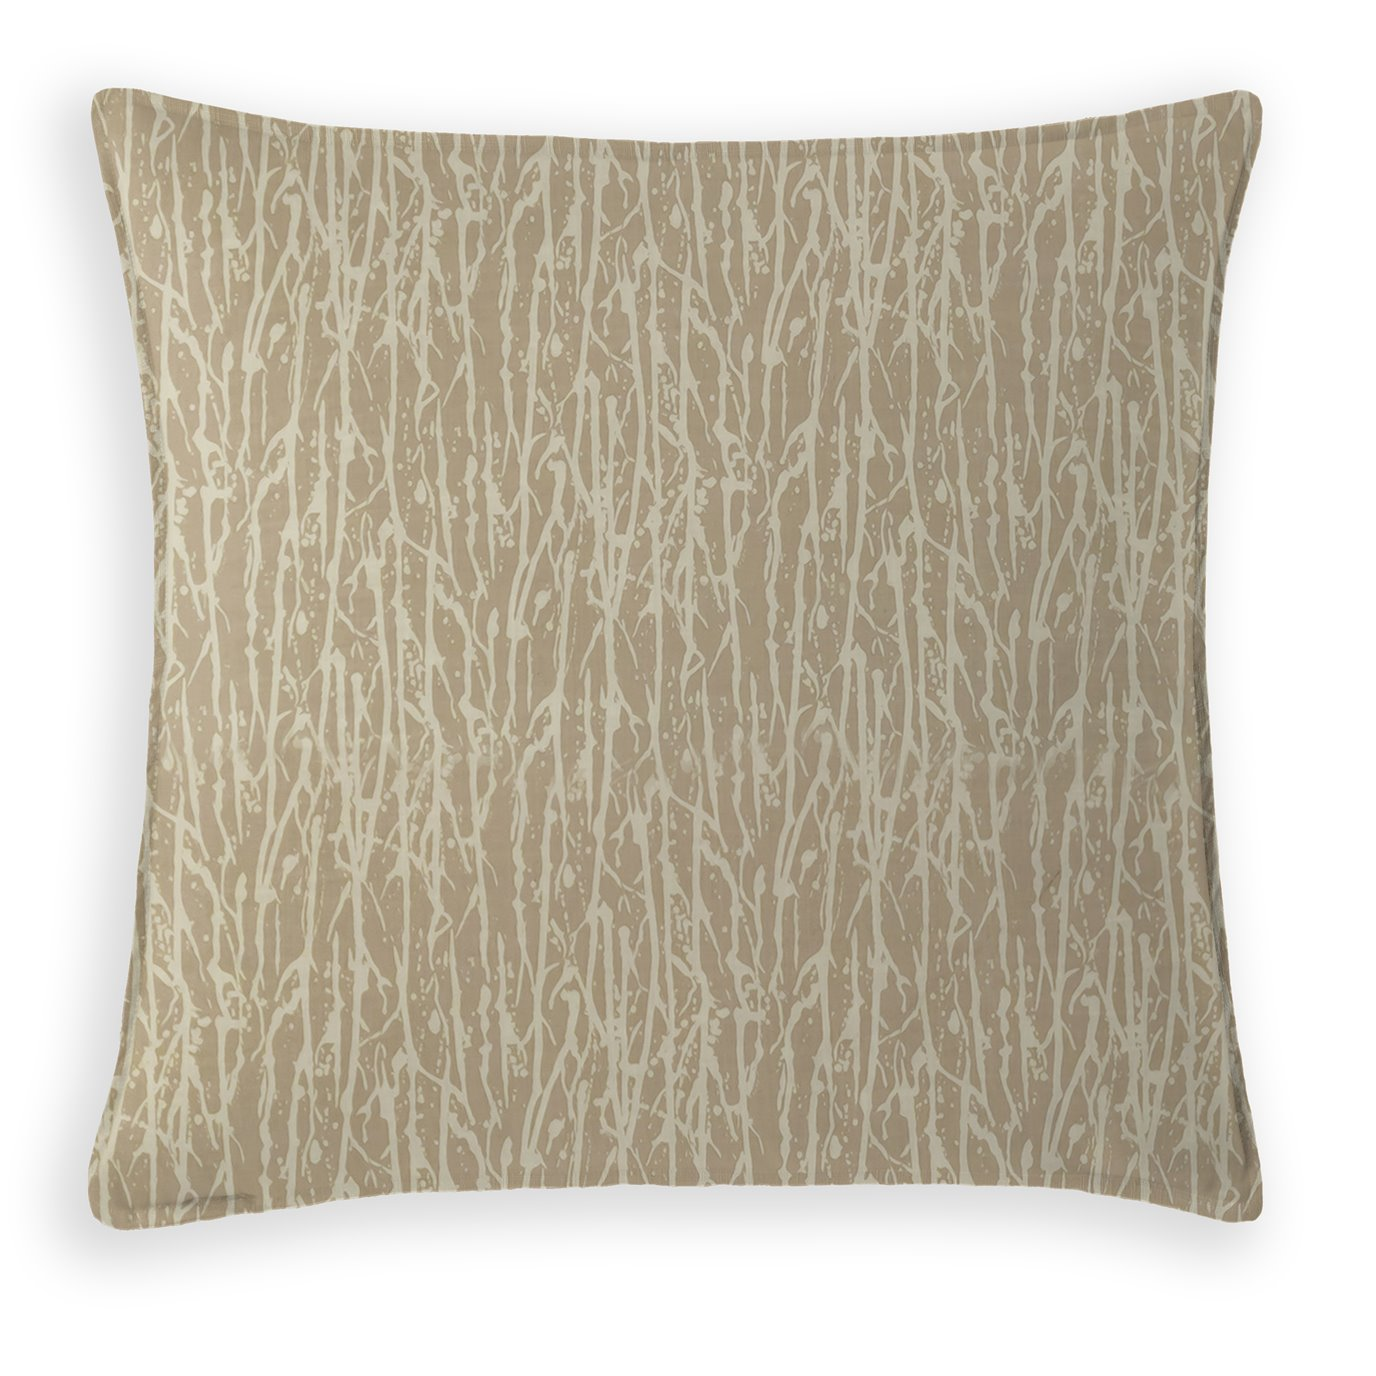 Willowbrook Decorative Cushion - 20 Inch Square - Coordinating Velvet